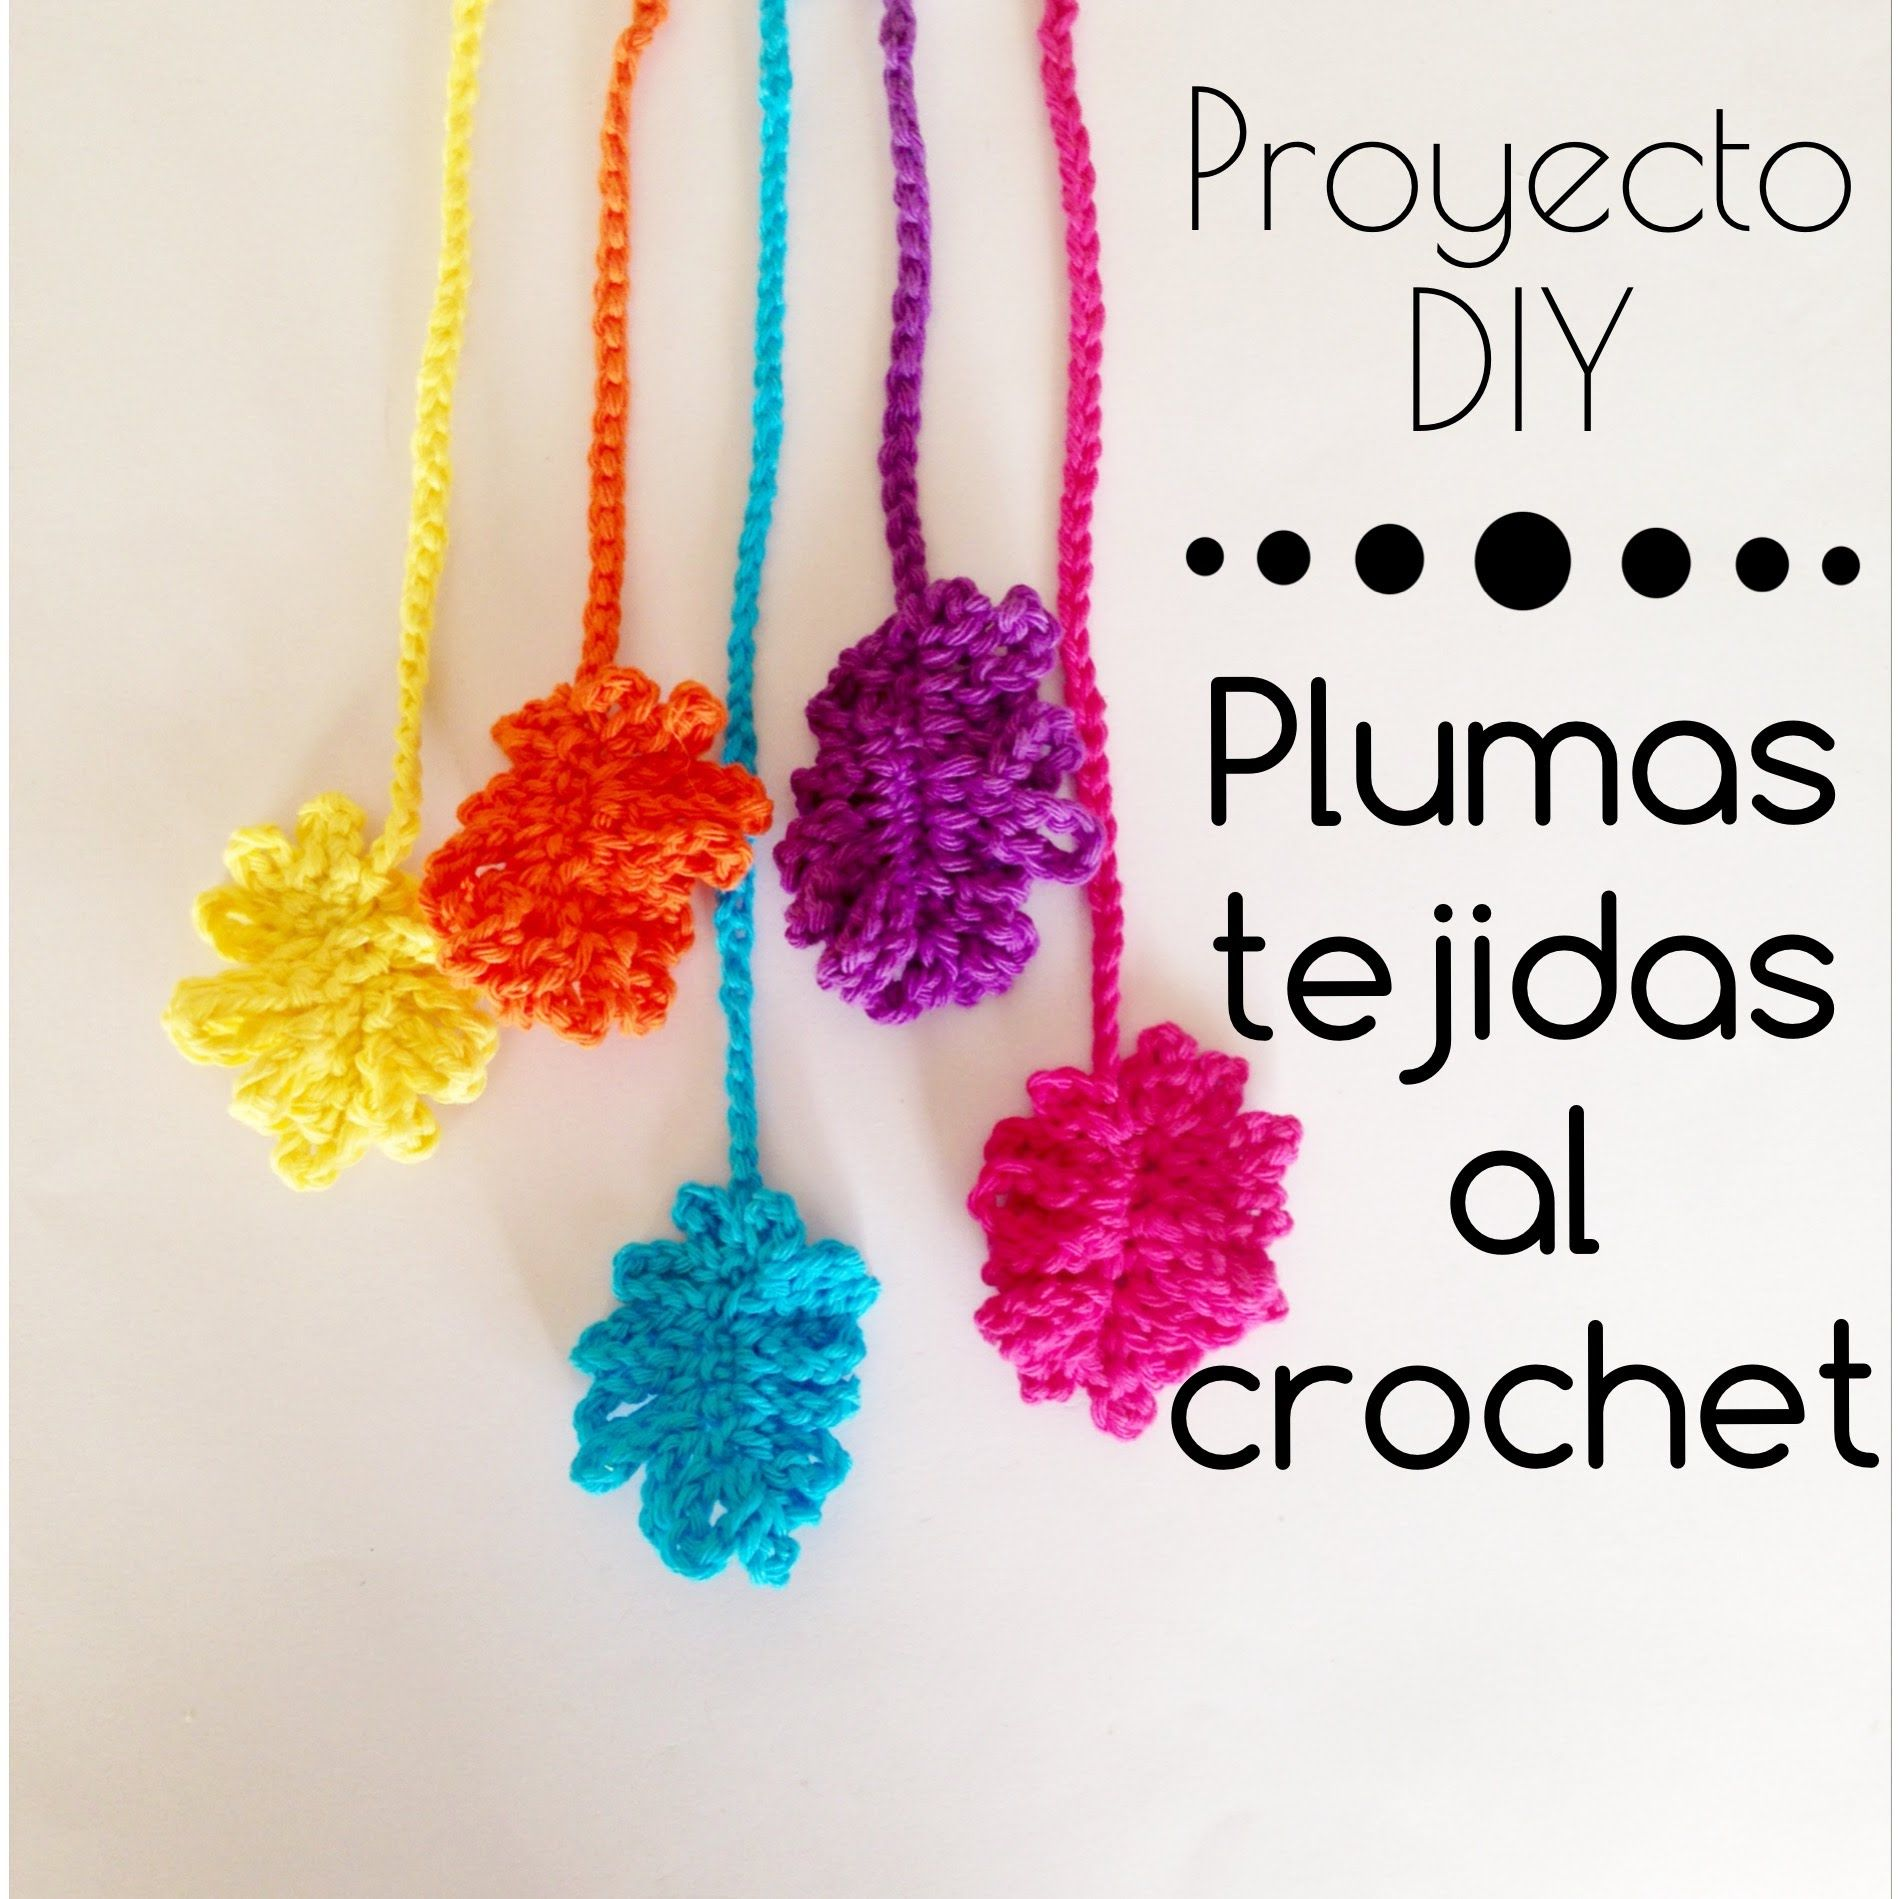 Plumas tejidas al crochet | tutoriales by adorei | Pinterest | Pluma ...